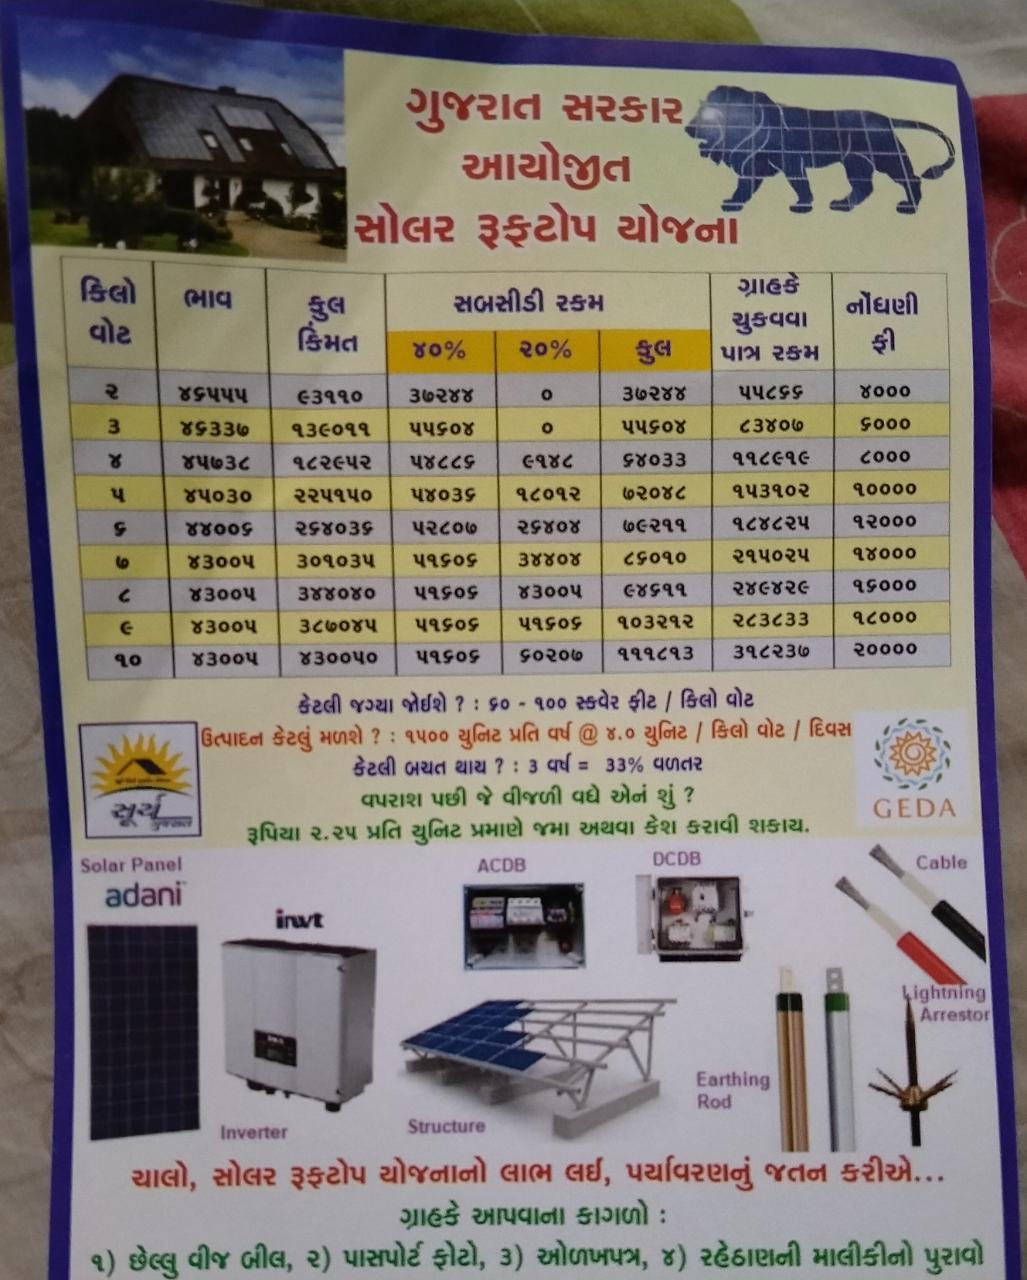 Samyak Solor Water Heater